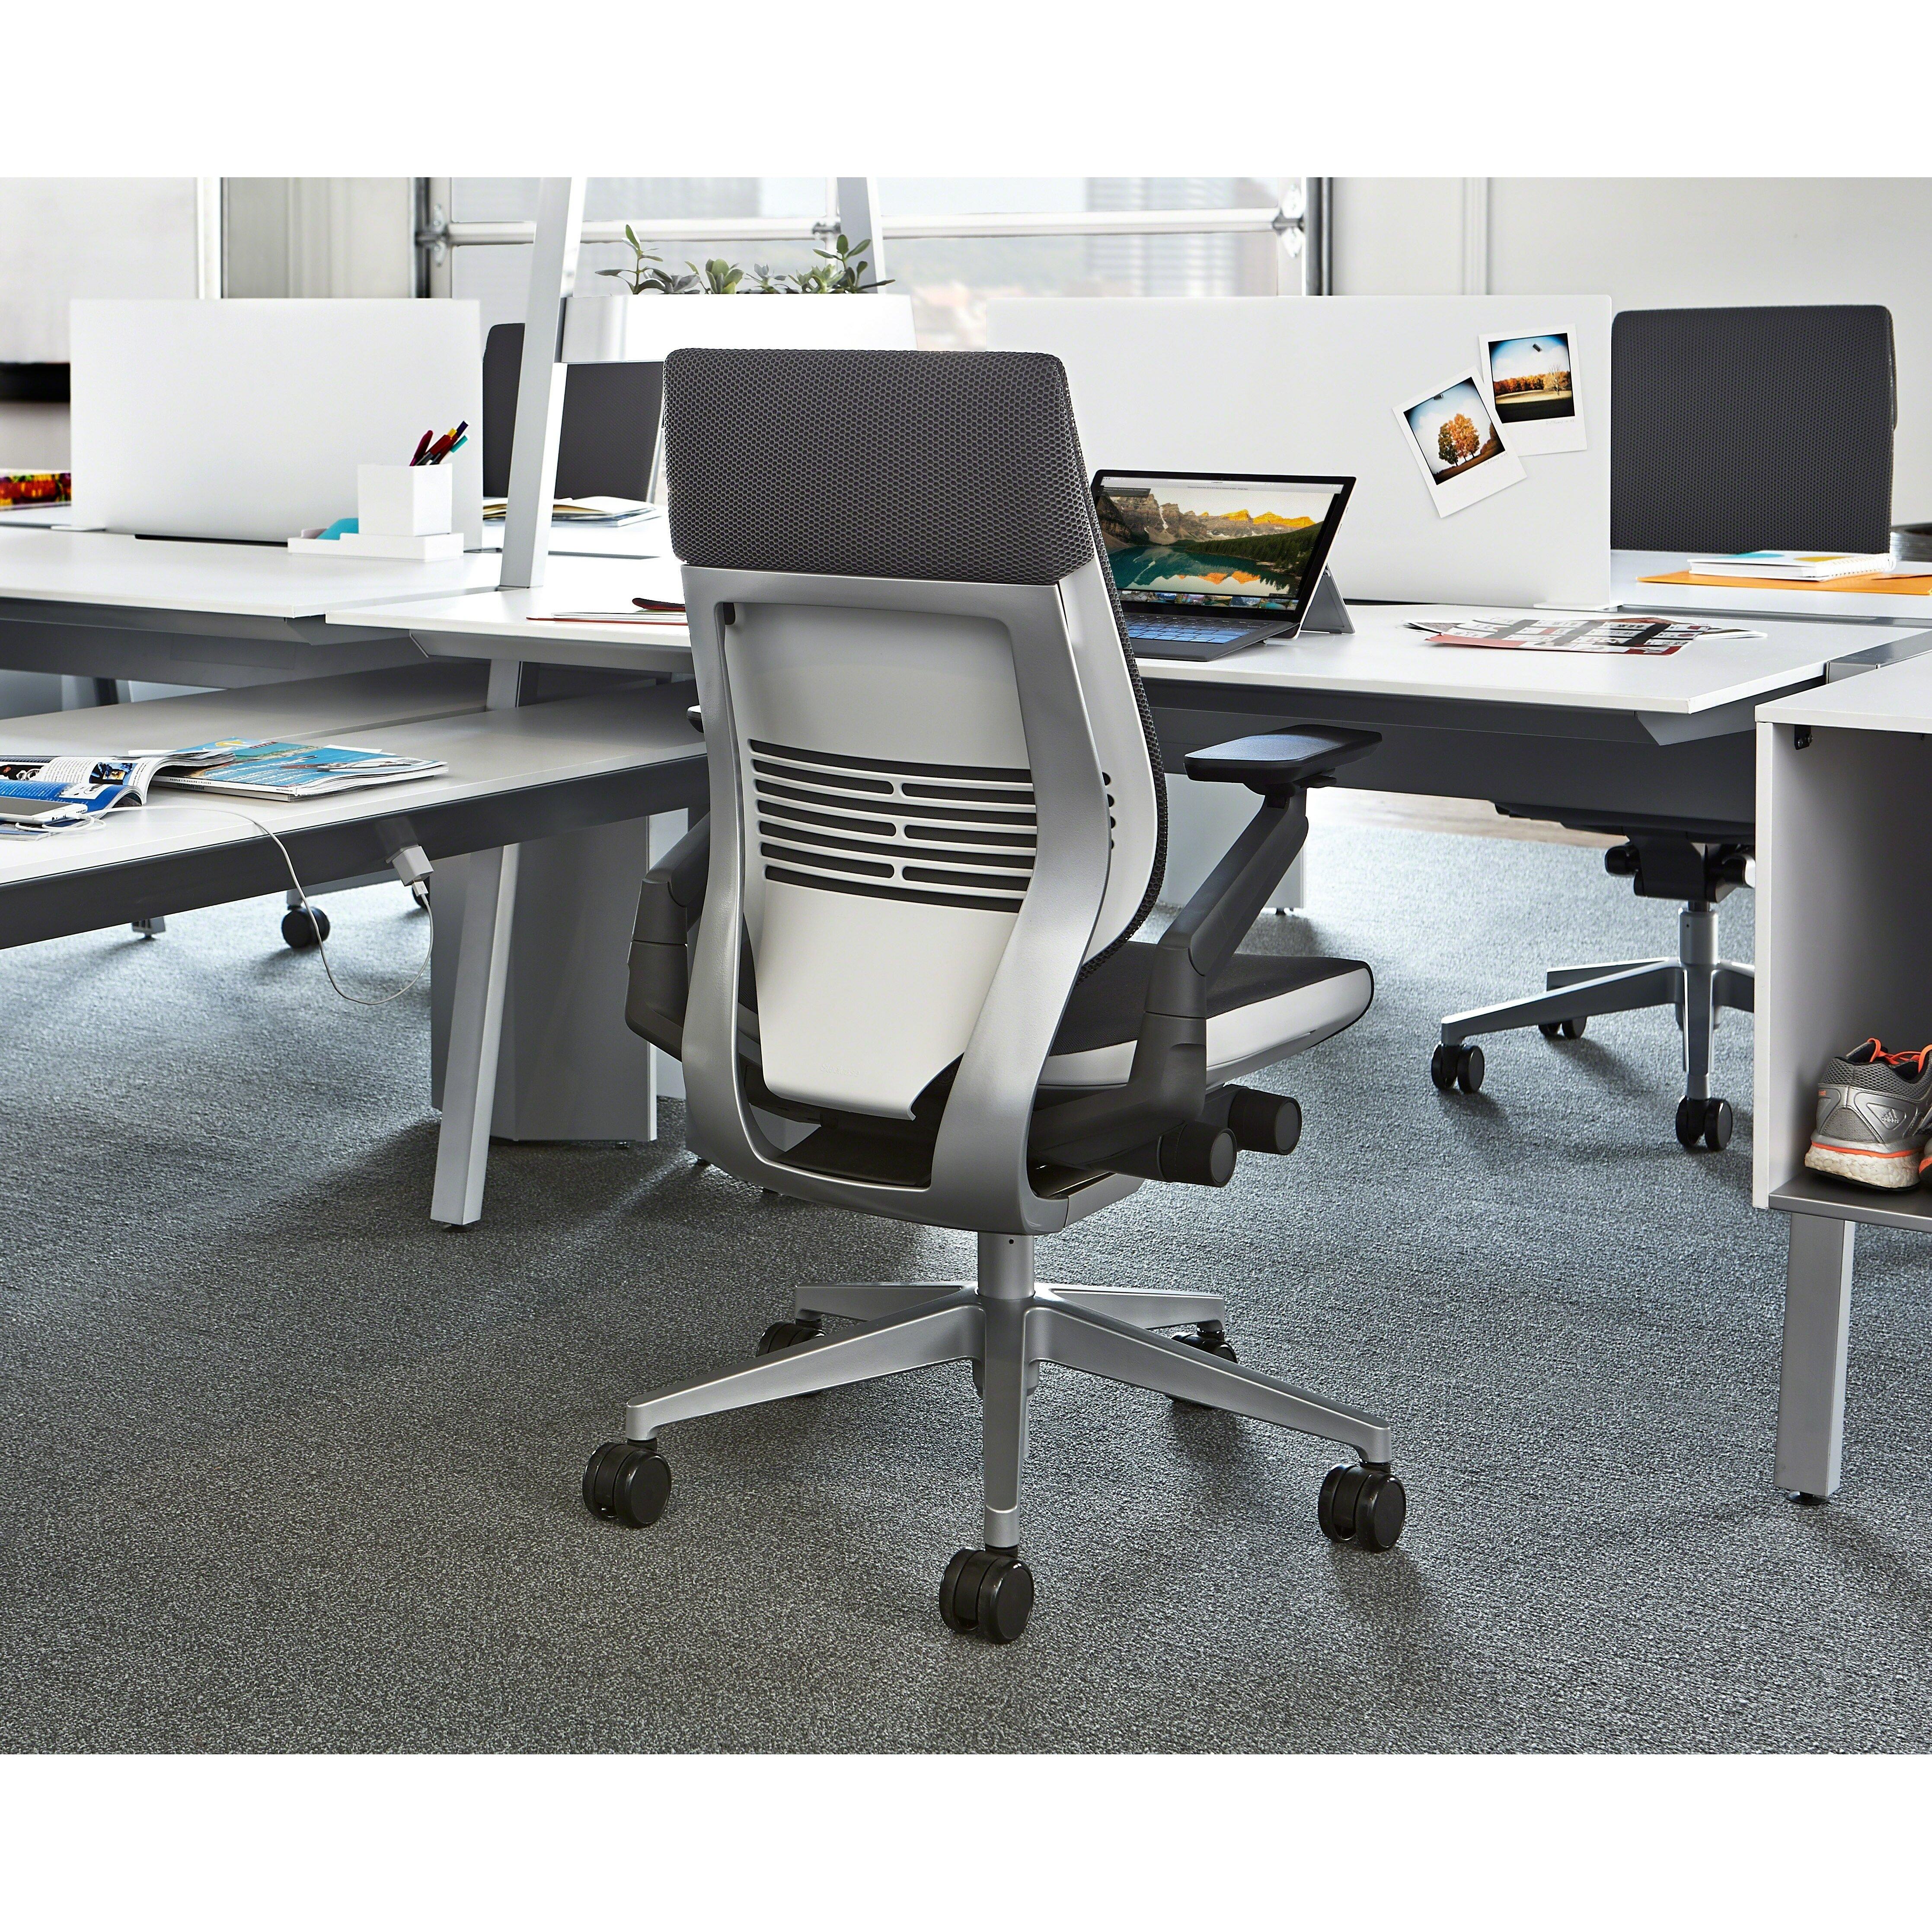 steelcase adjustable desk on vaporbullfl com overstock tiffany table lamps on vaporbullfl com